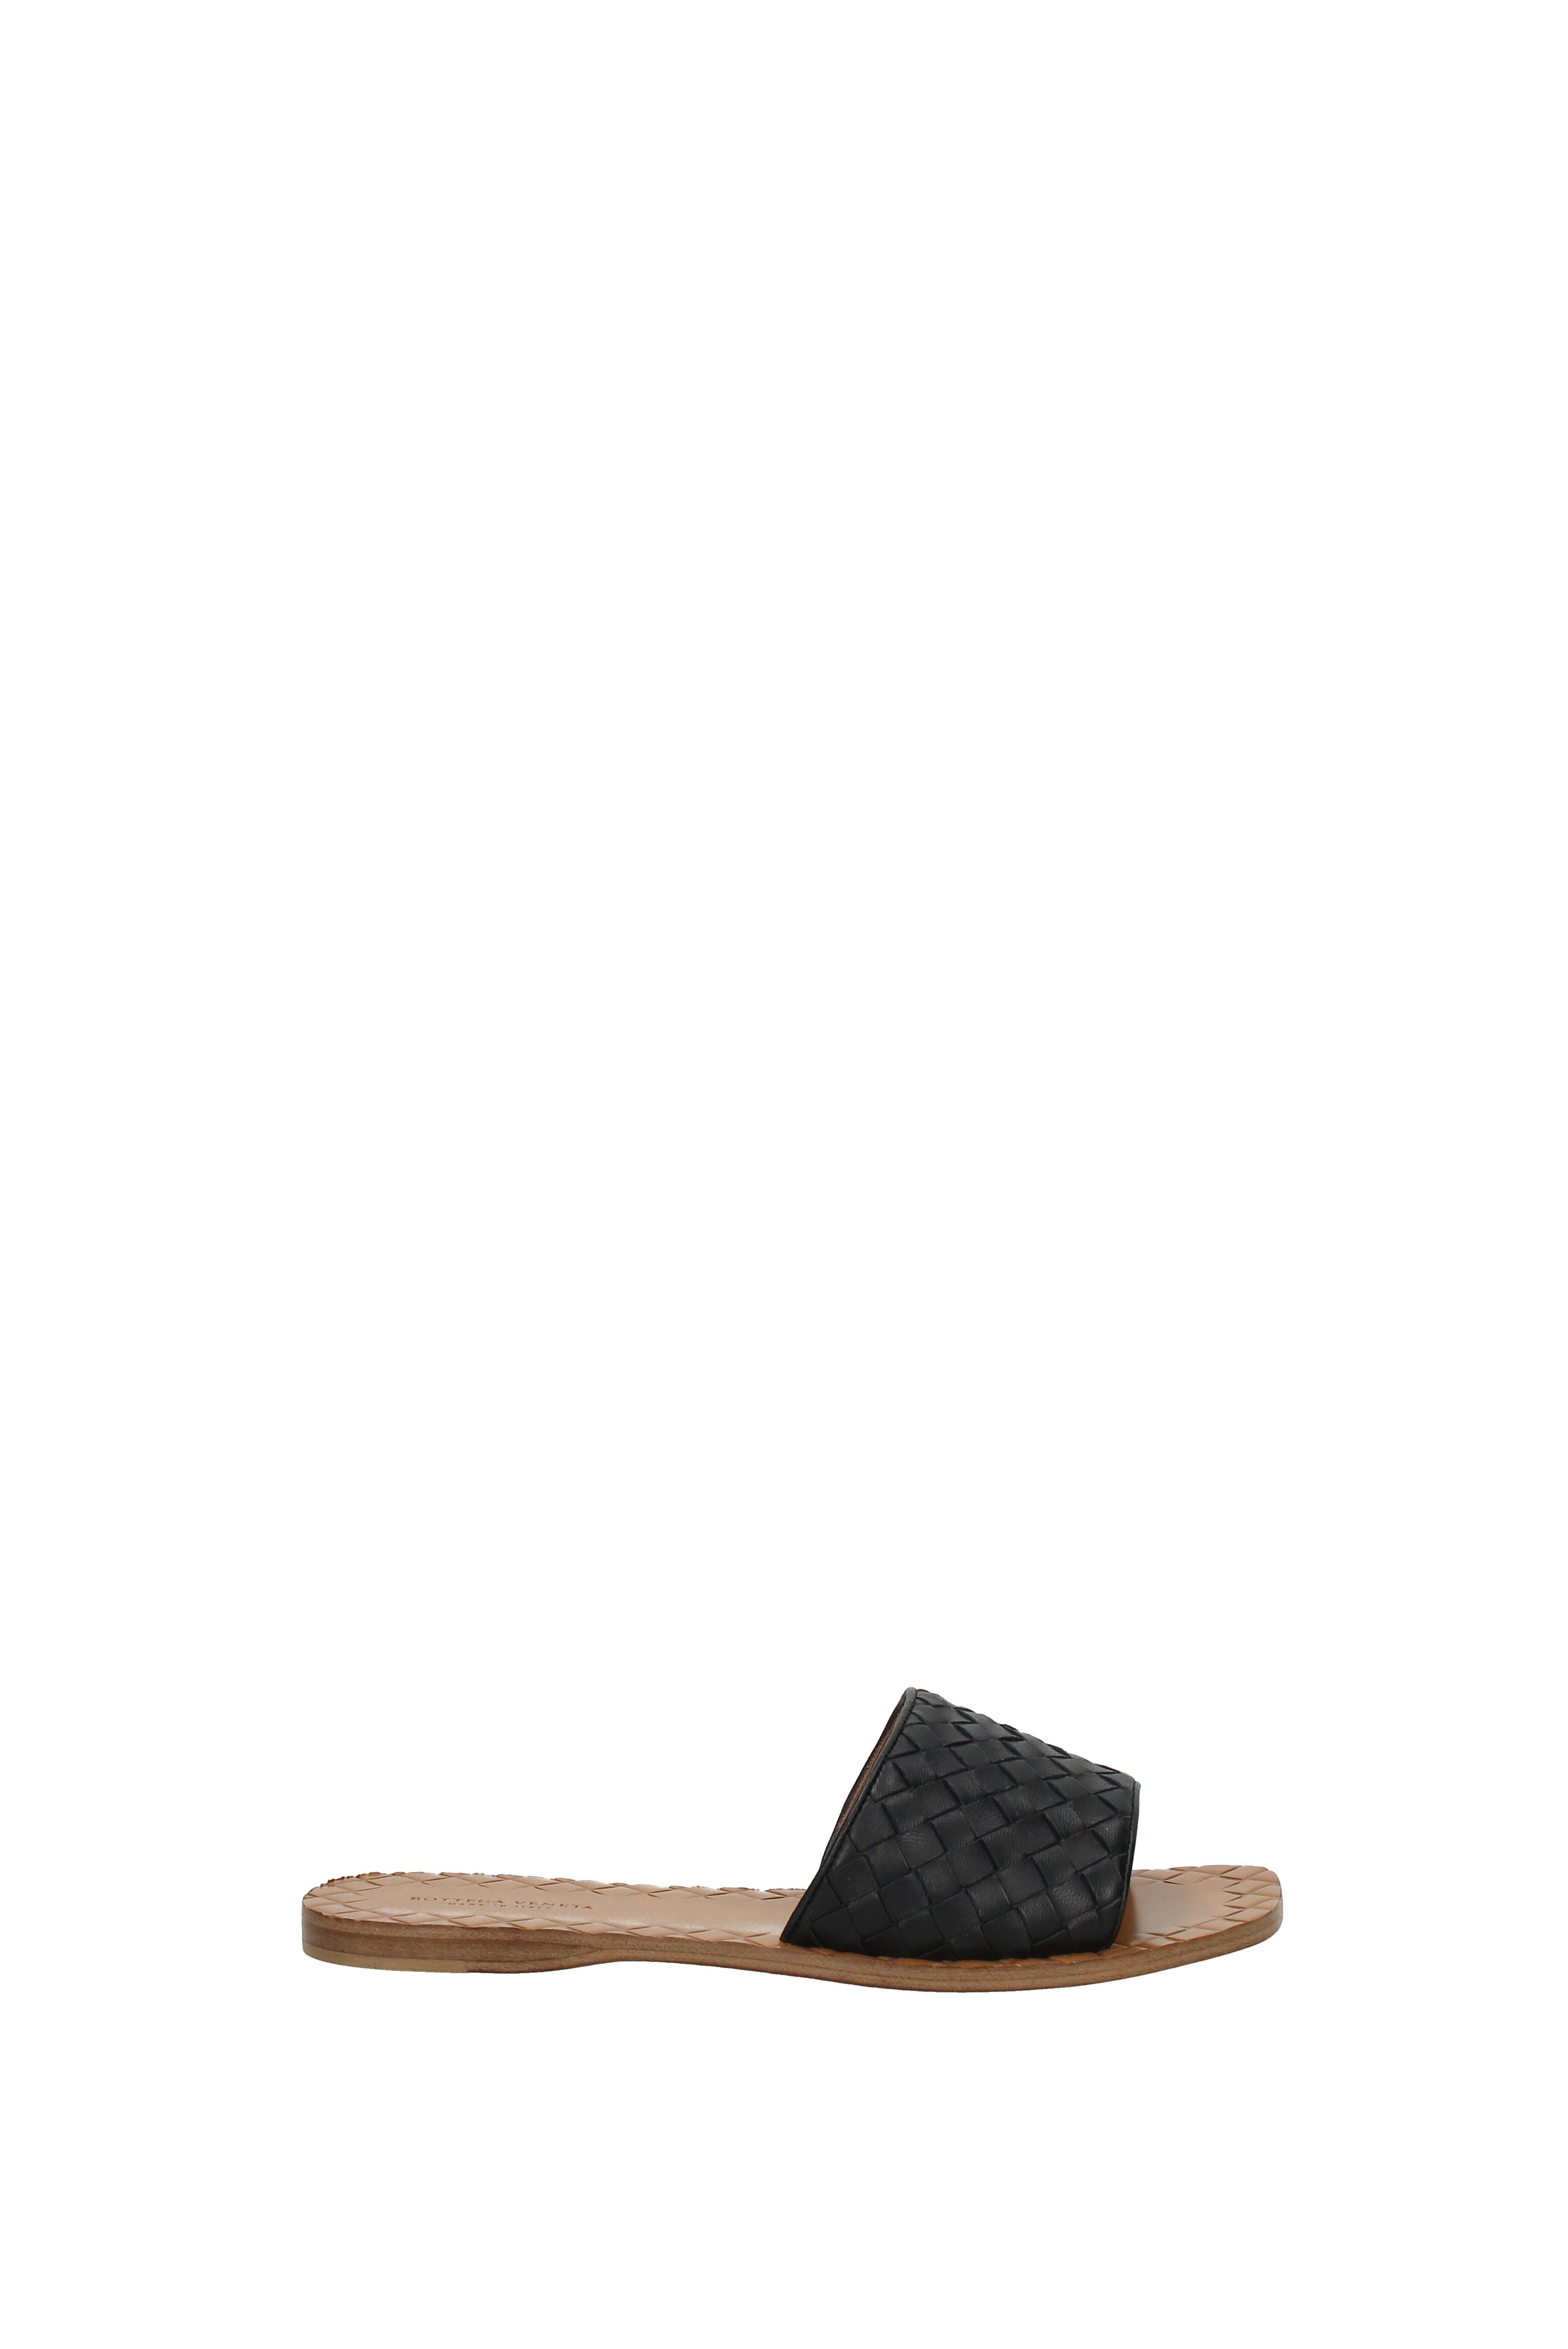 Flip-Flops und Holzschuhe Holzschuhe Holzschuhe Bottega Veneta Damen - Leder (409276V0013) e46d1c